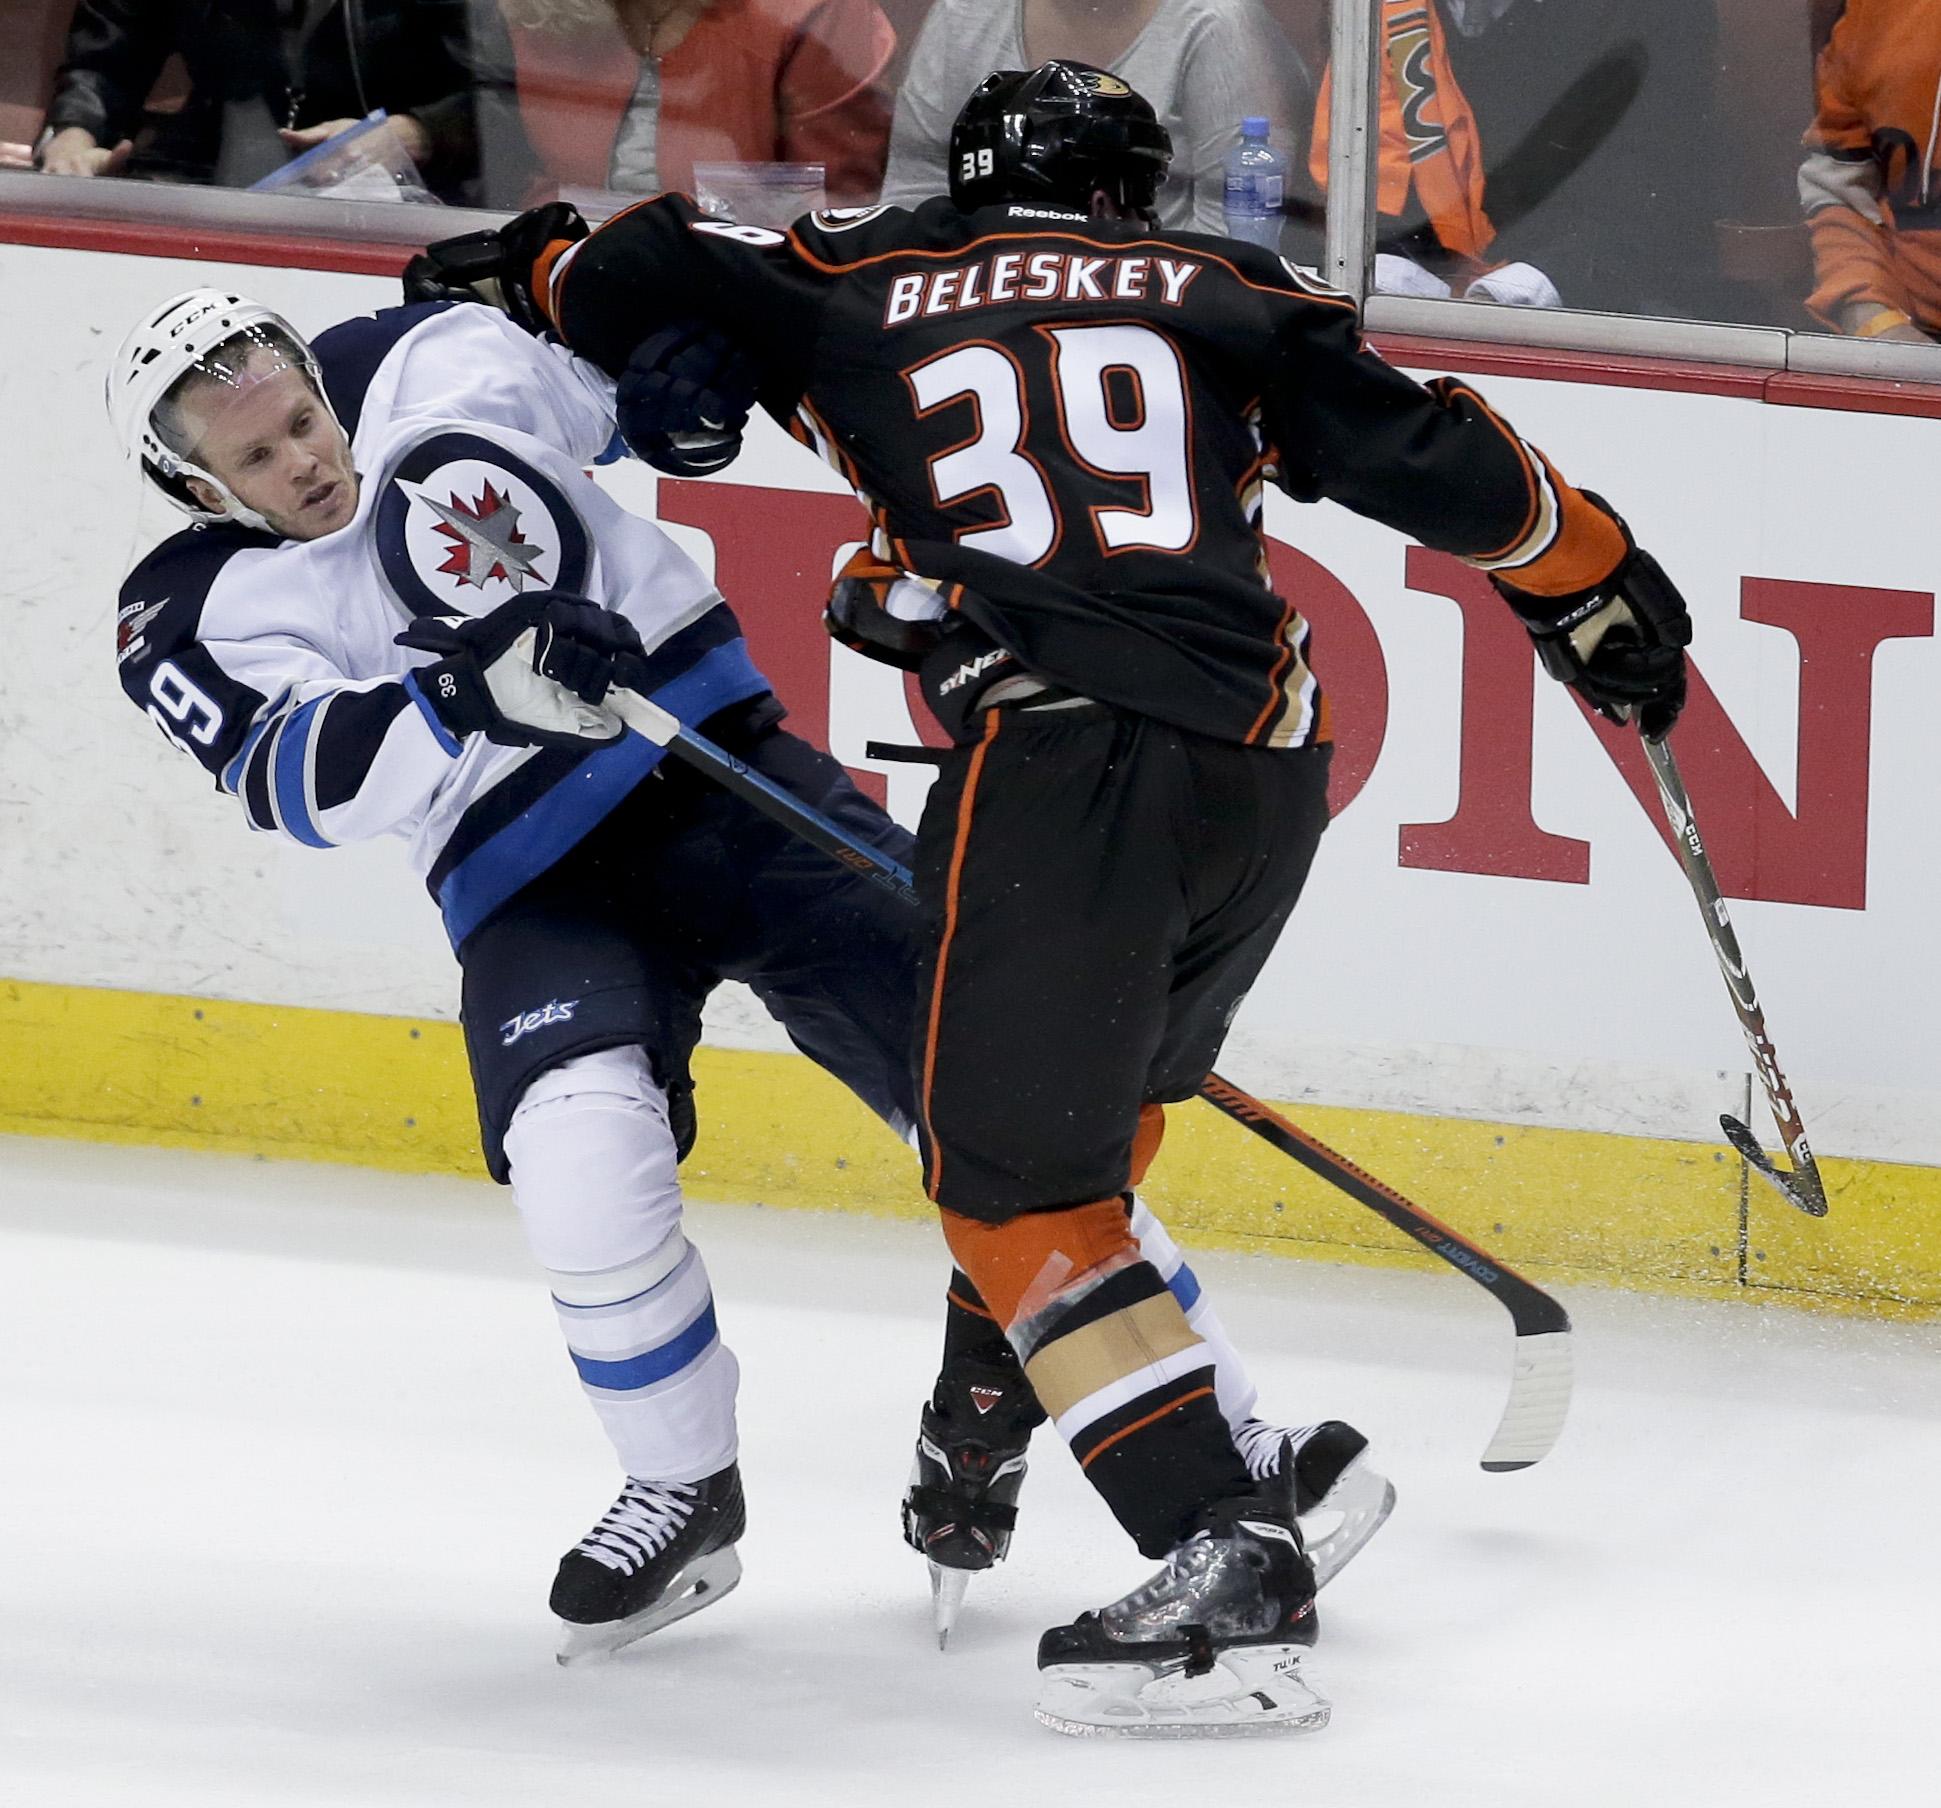 Anaheim Ducks left wing Matt Beleskey, right, checks Winnipeg Jets defenseman Tobias Enstrom during the second period of Game 1 of a first-round NHL hockey playoff series in Anaheim, Calif., Thursday, April 16, 2015. (AP Photo/Chris Carlson)